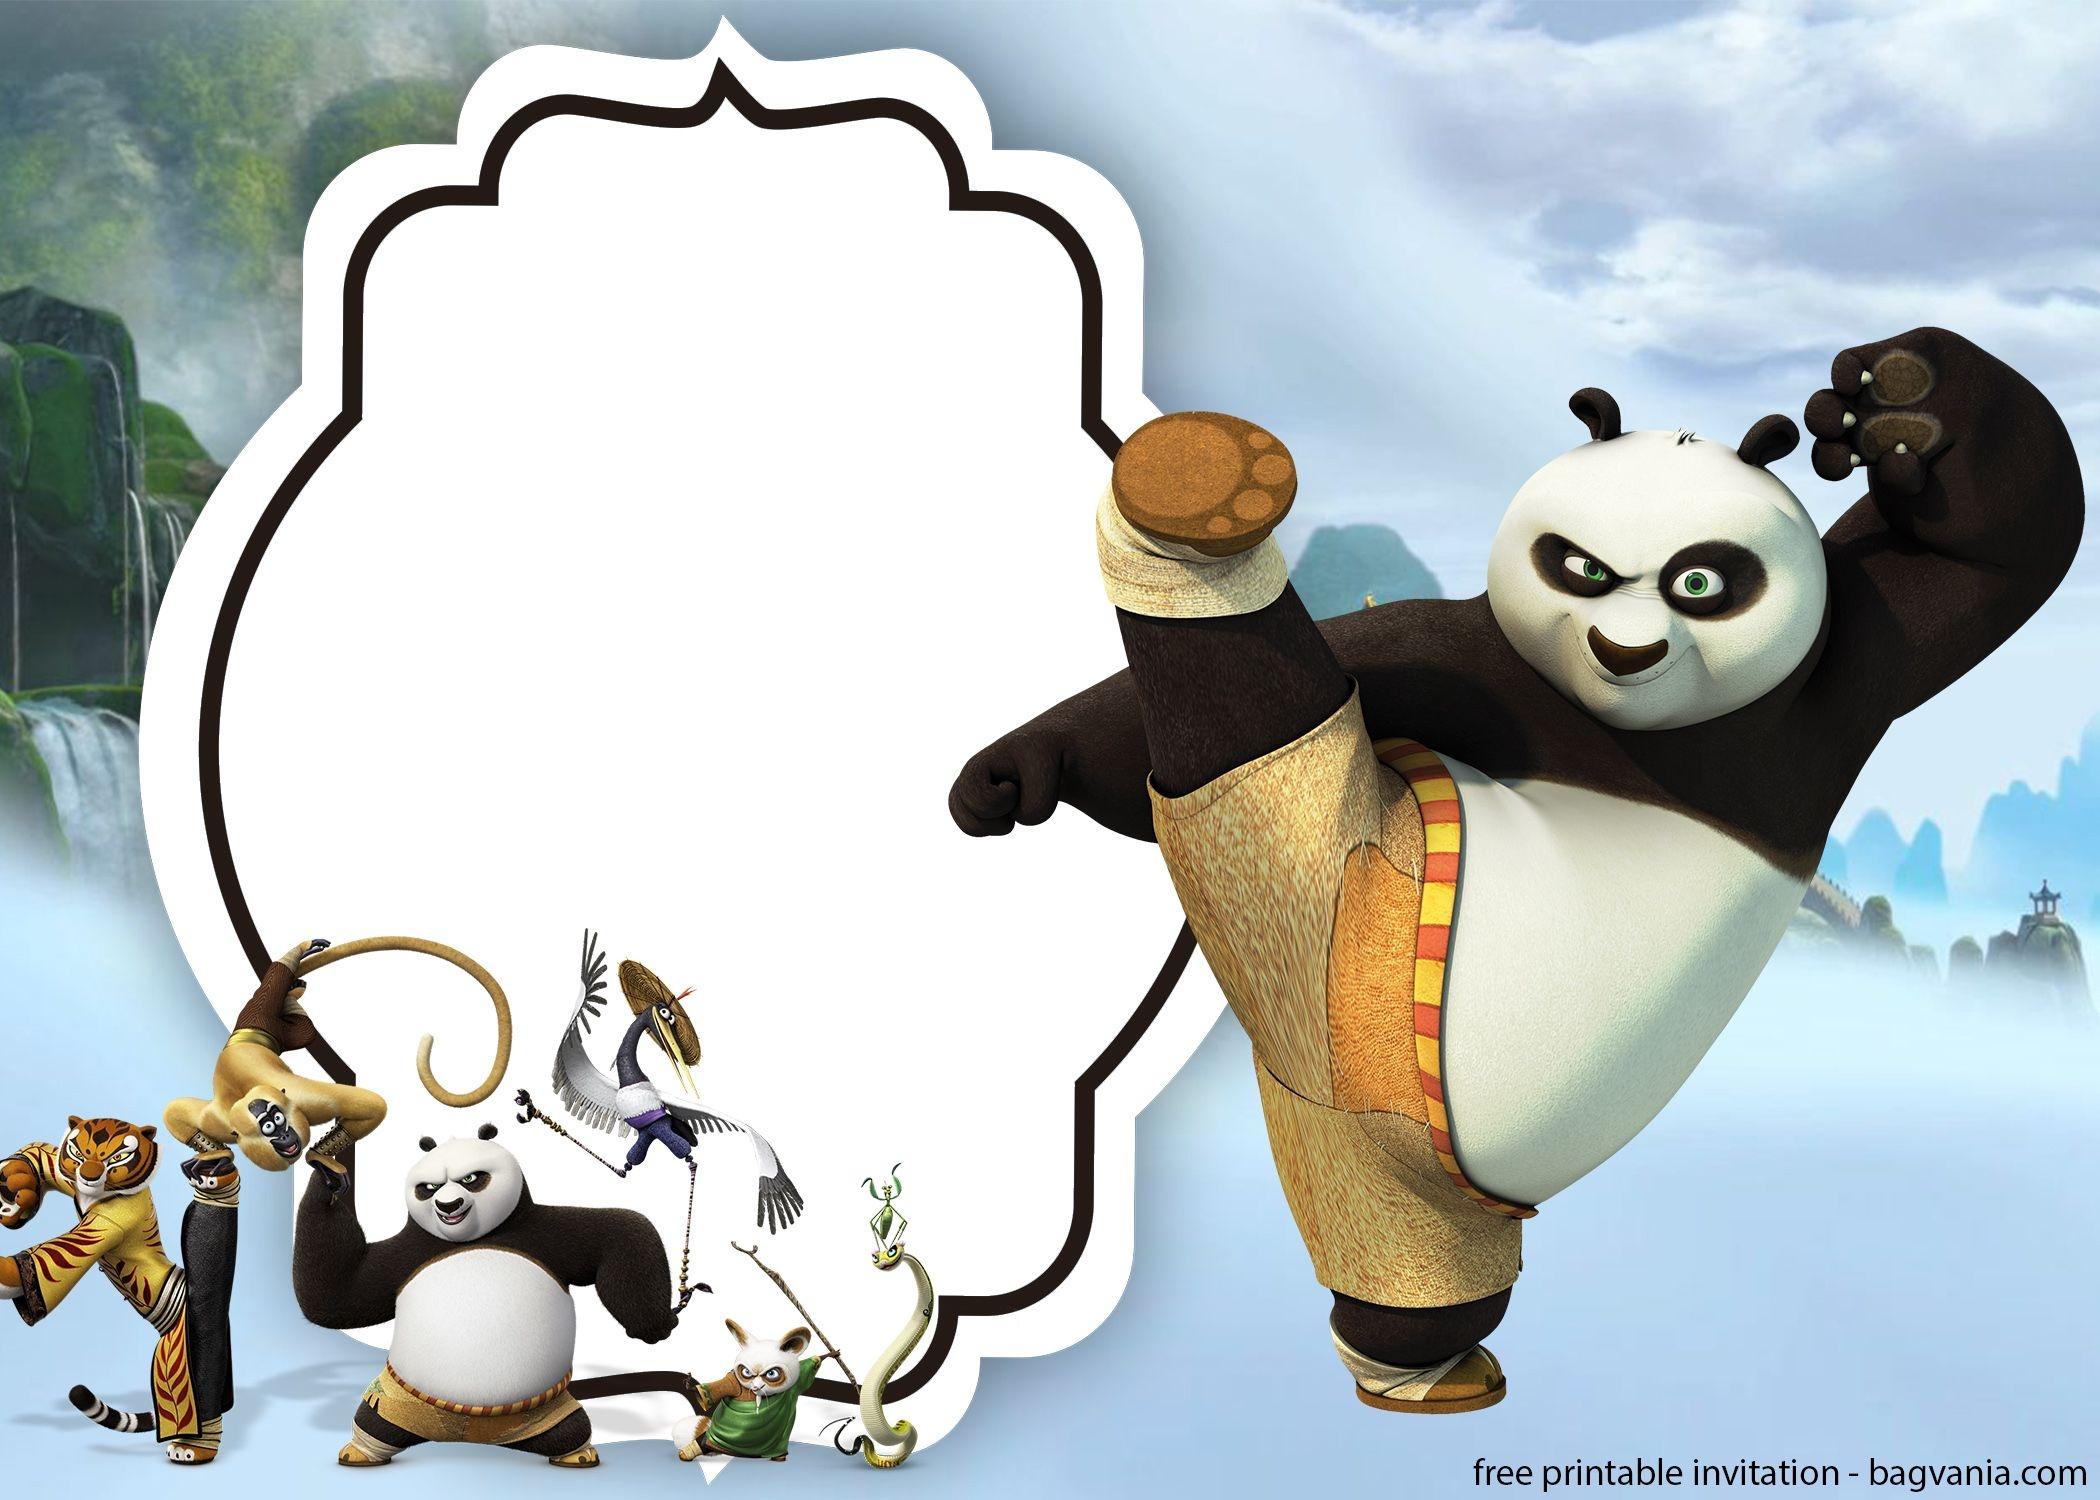 Free Kungfu Panda Invitations Templates | Bagvania Invitation - Panda Bear Invitations Free Printable